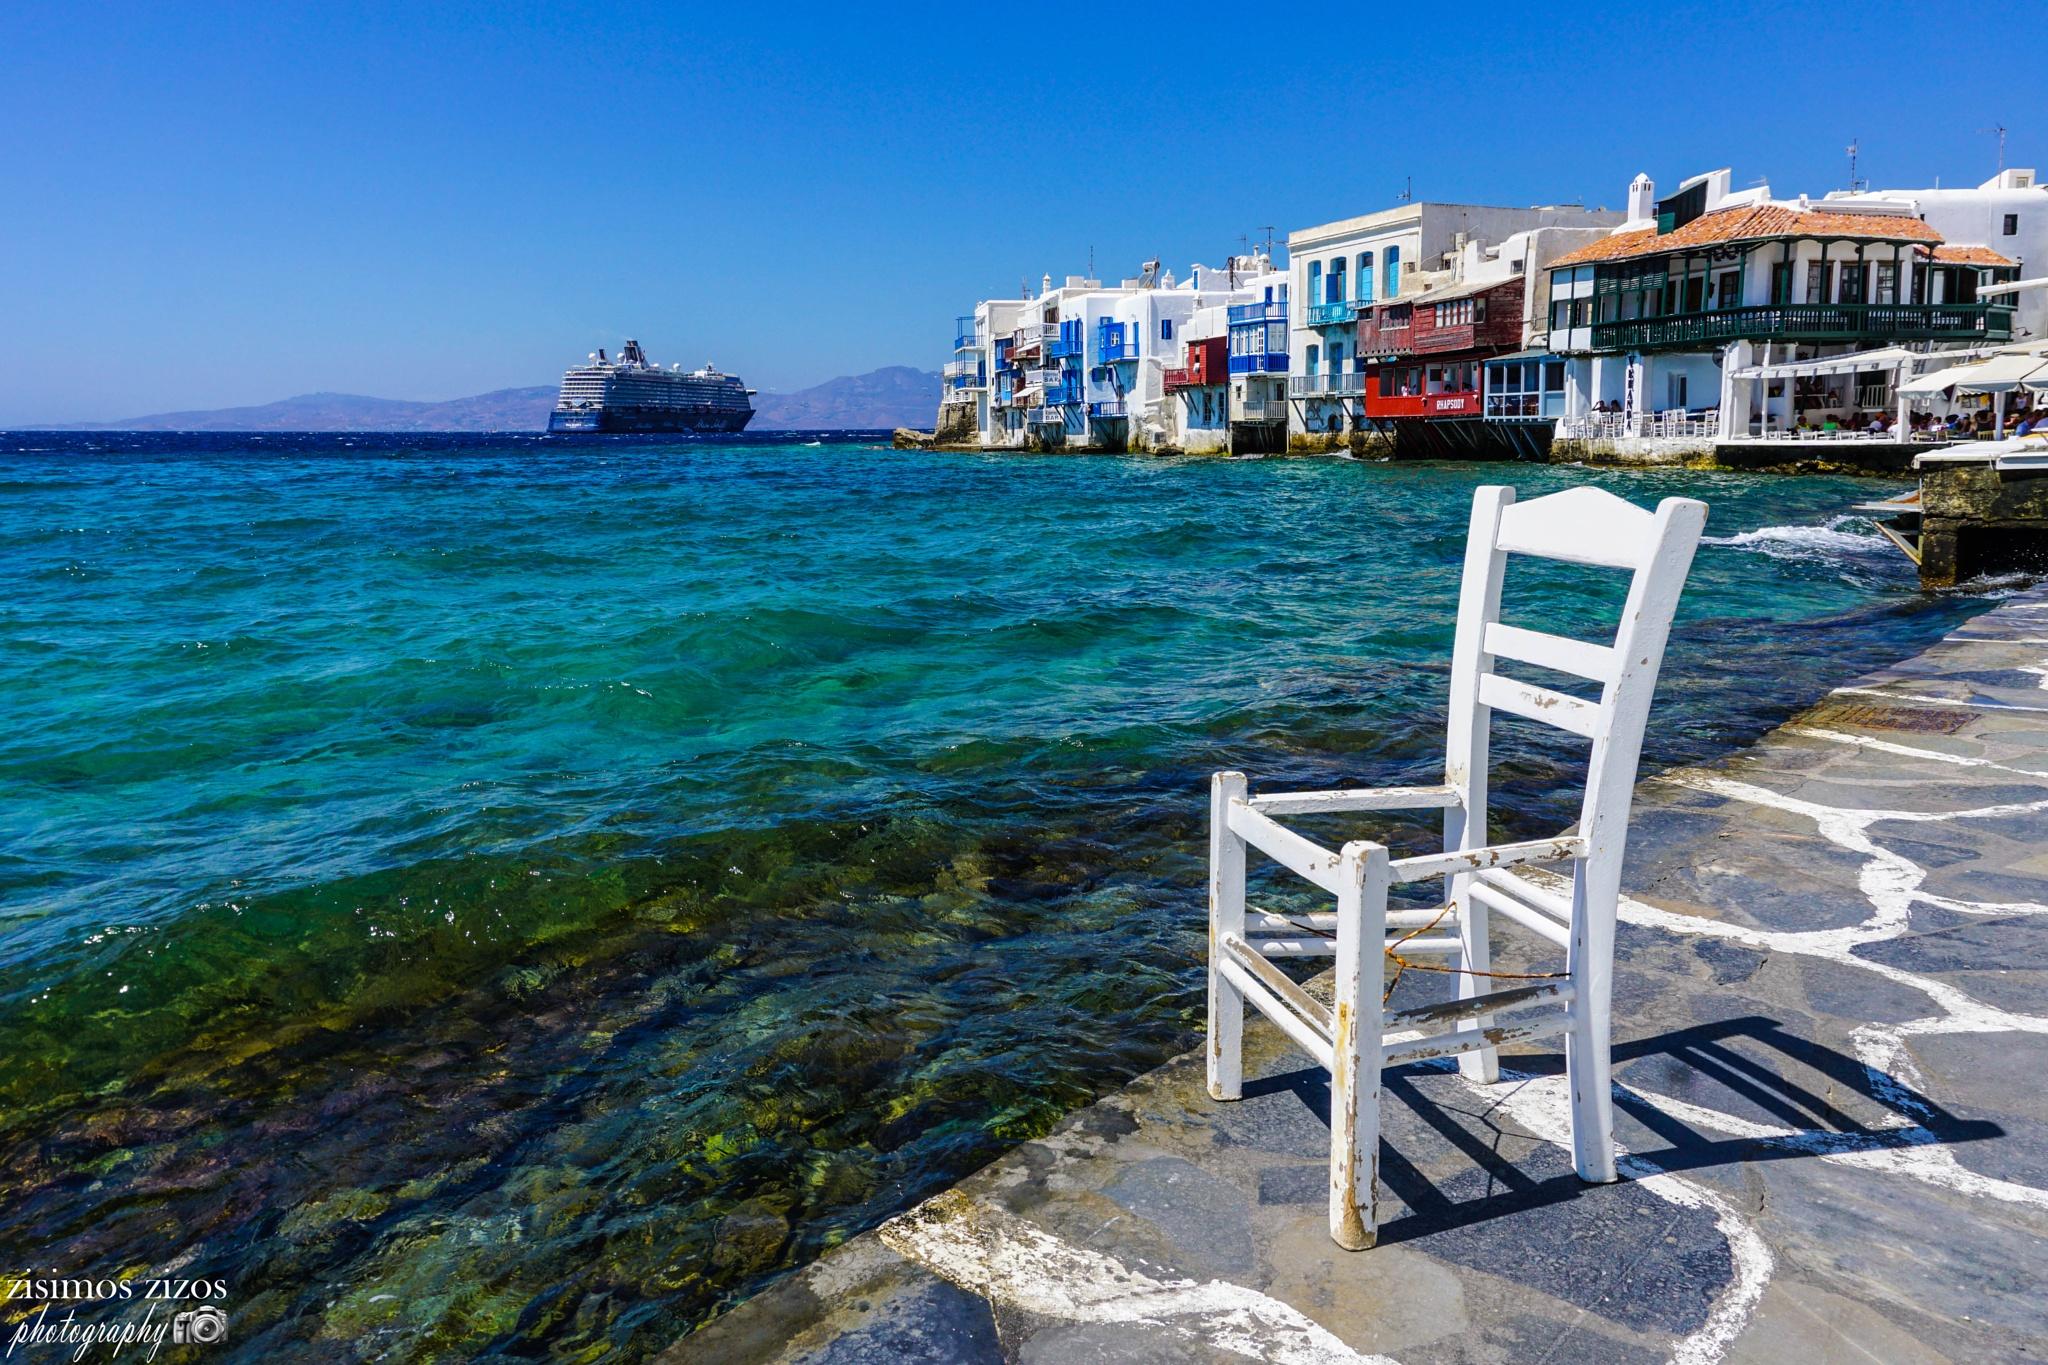 Little Venice, Mykonos by Zisimos Zizos